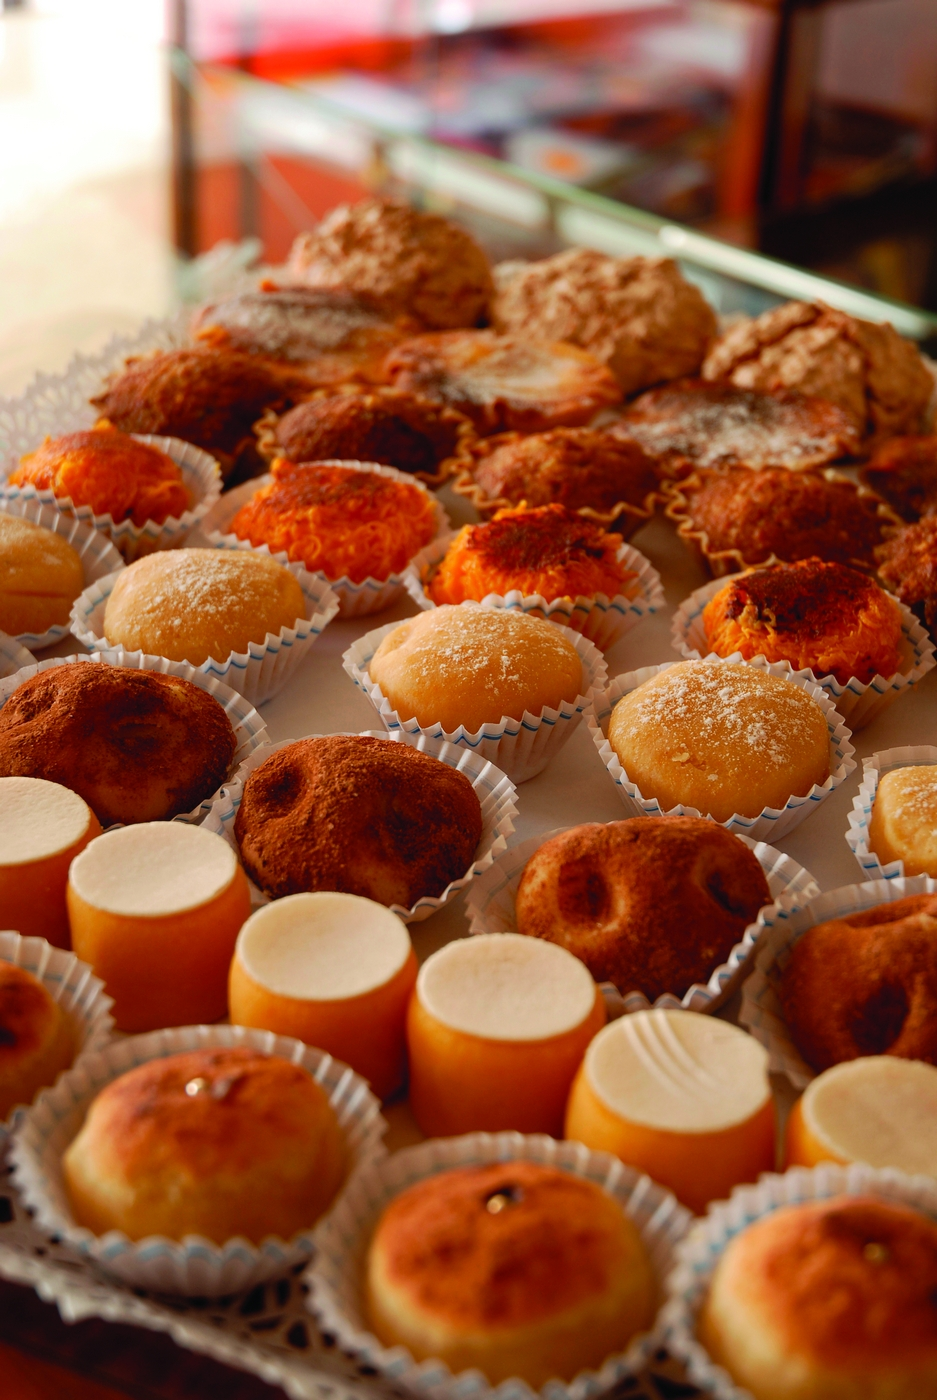 Kozak tęskni za portugalskimi ciastkami